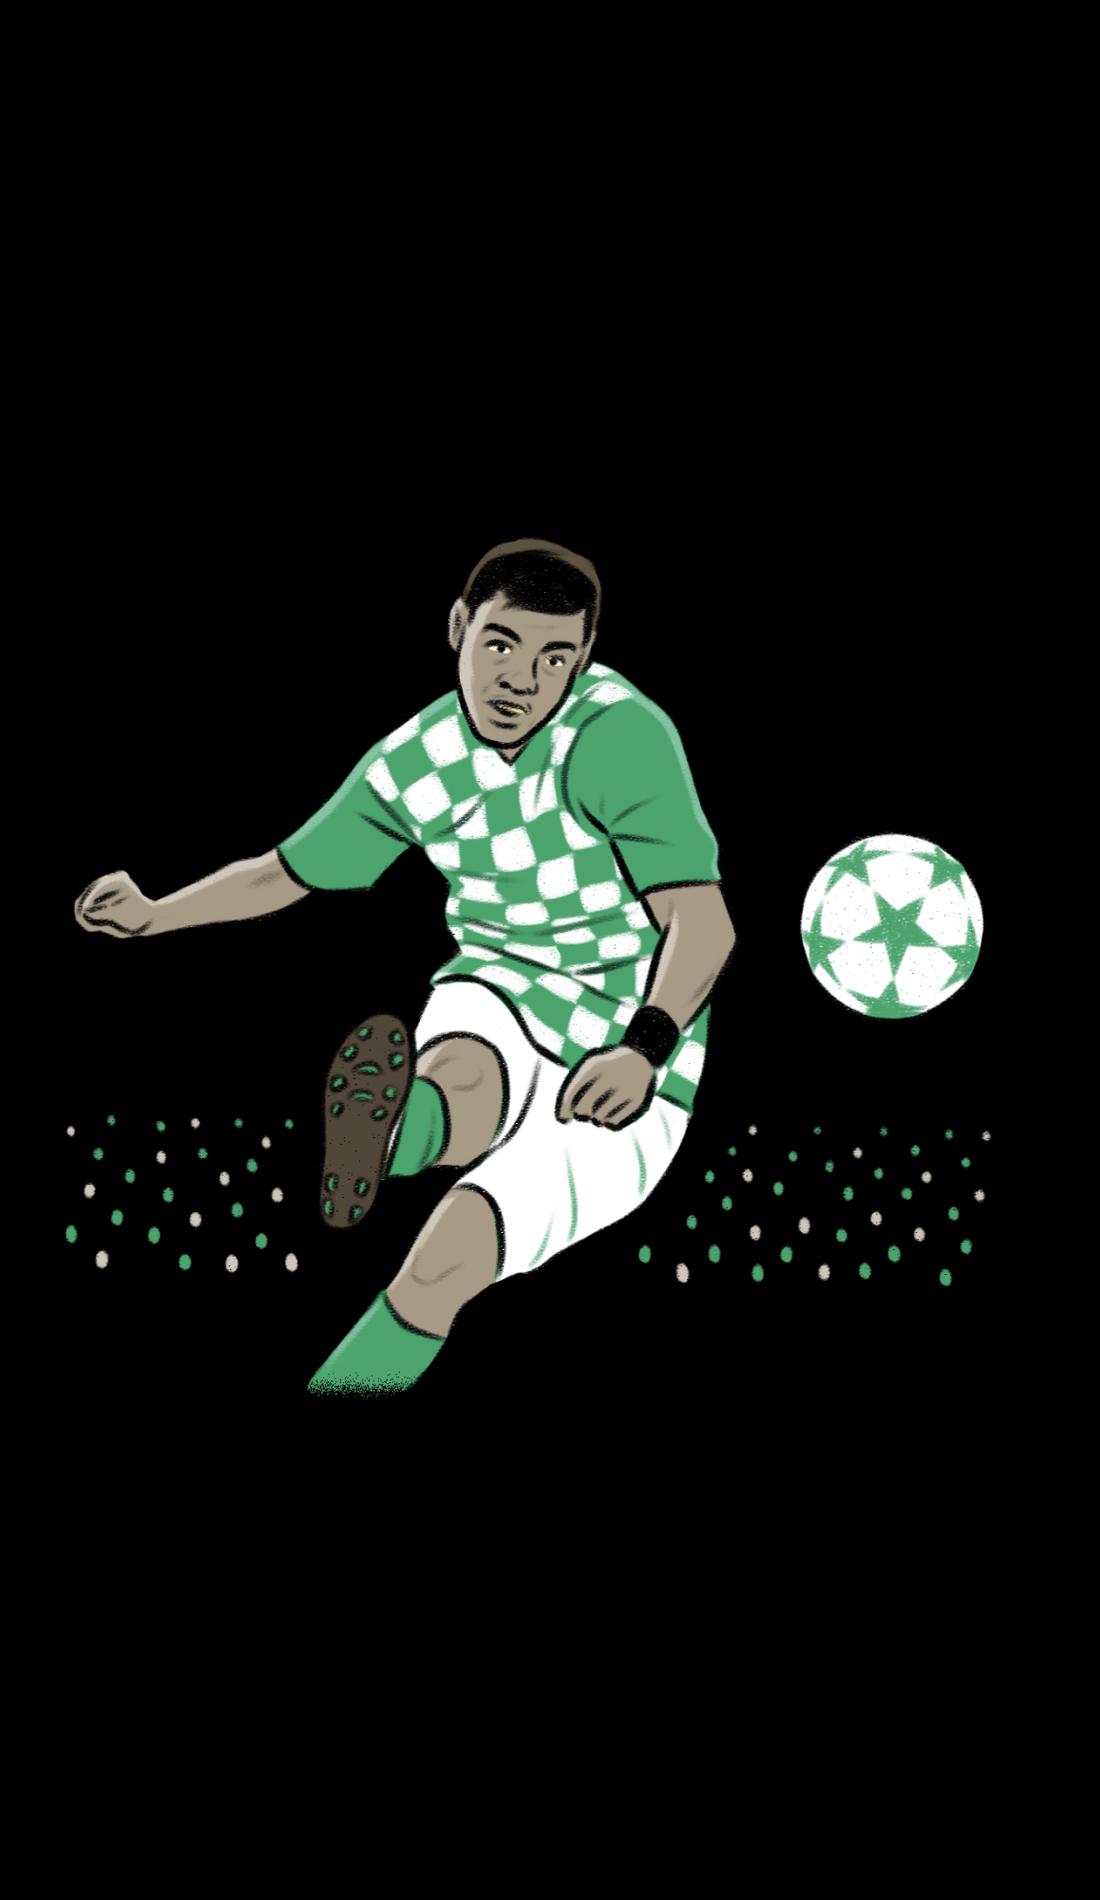 A U.S. Women's National Soccer Team live event